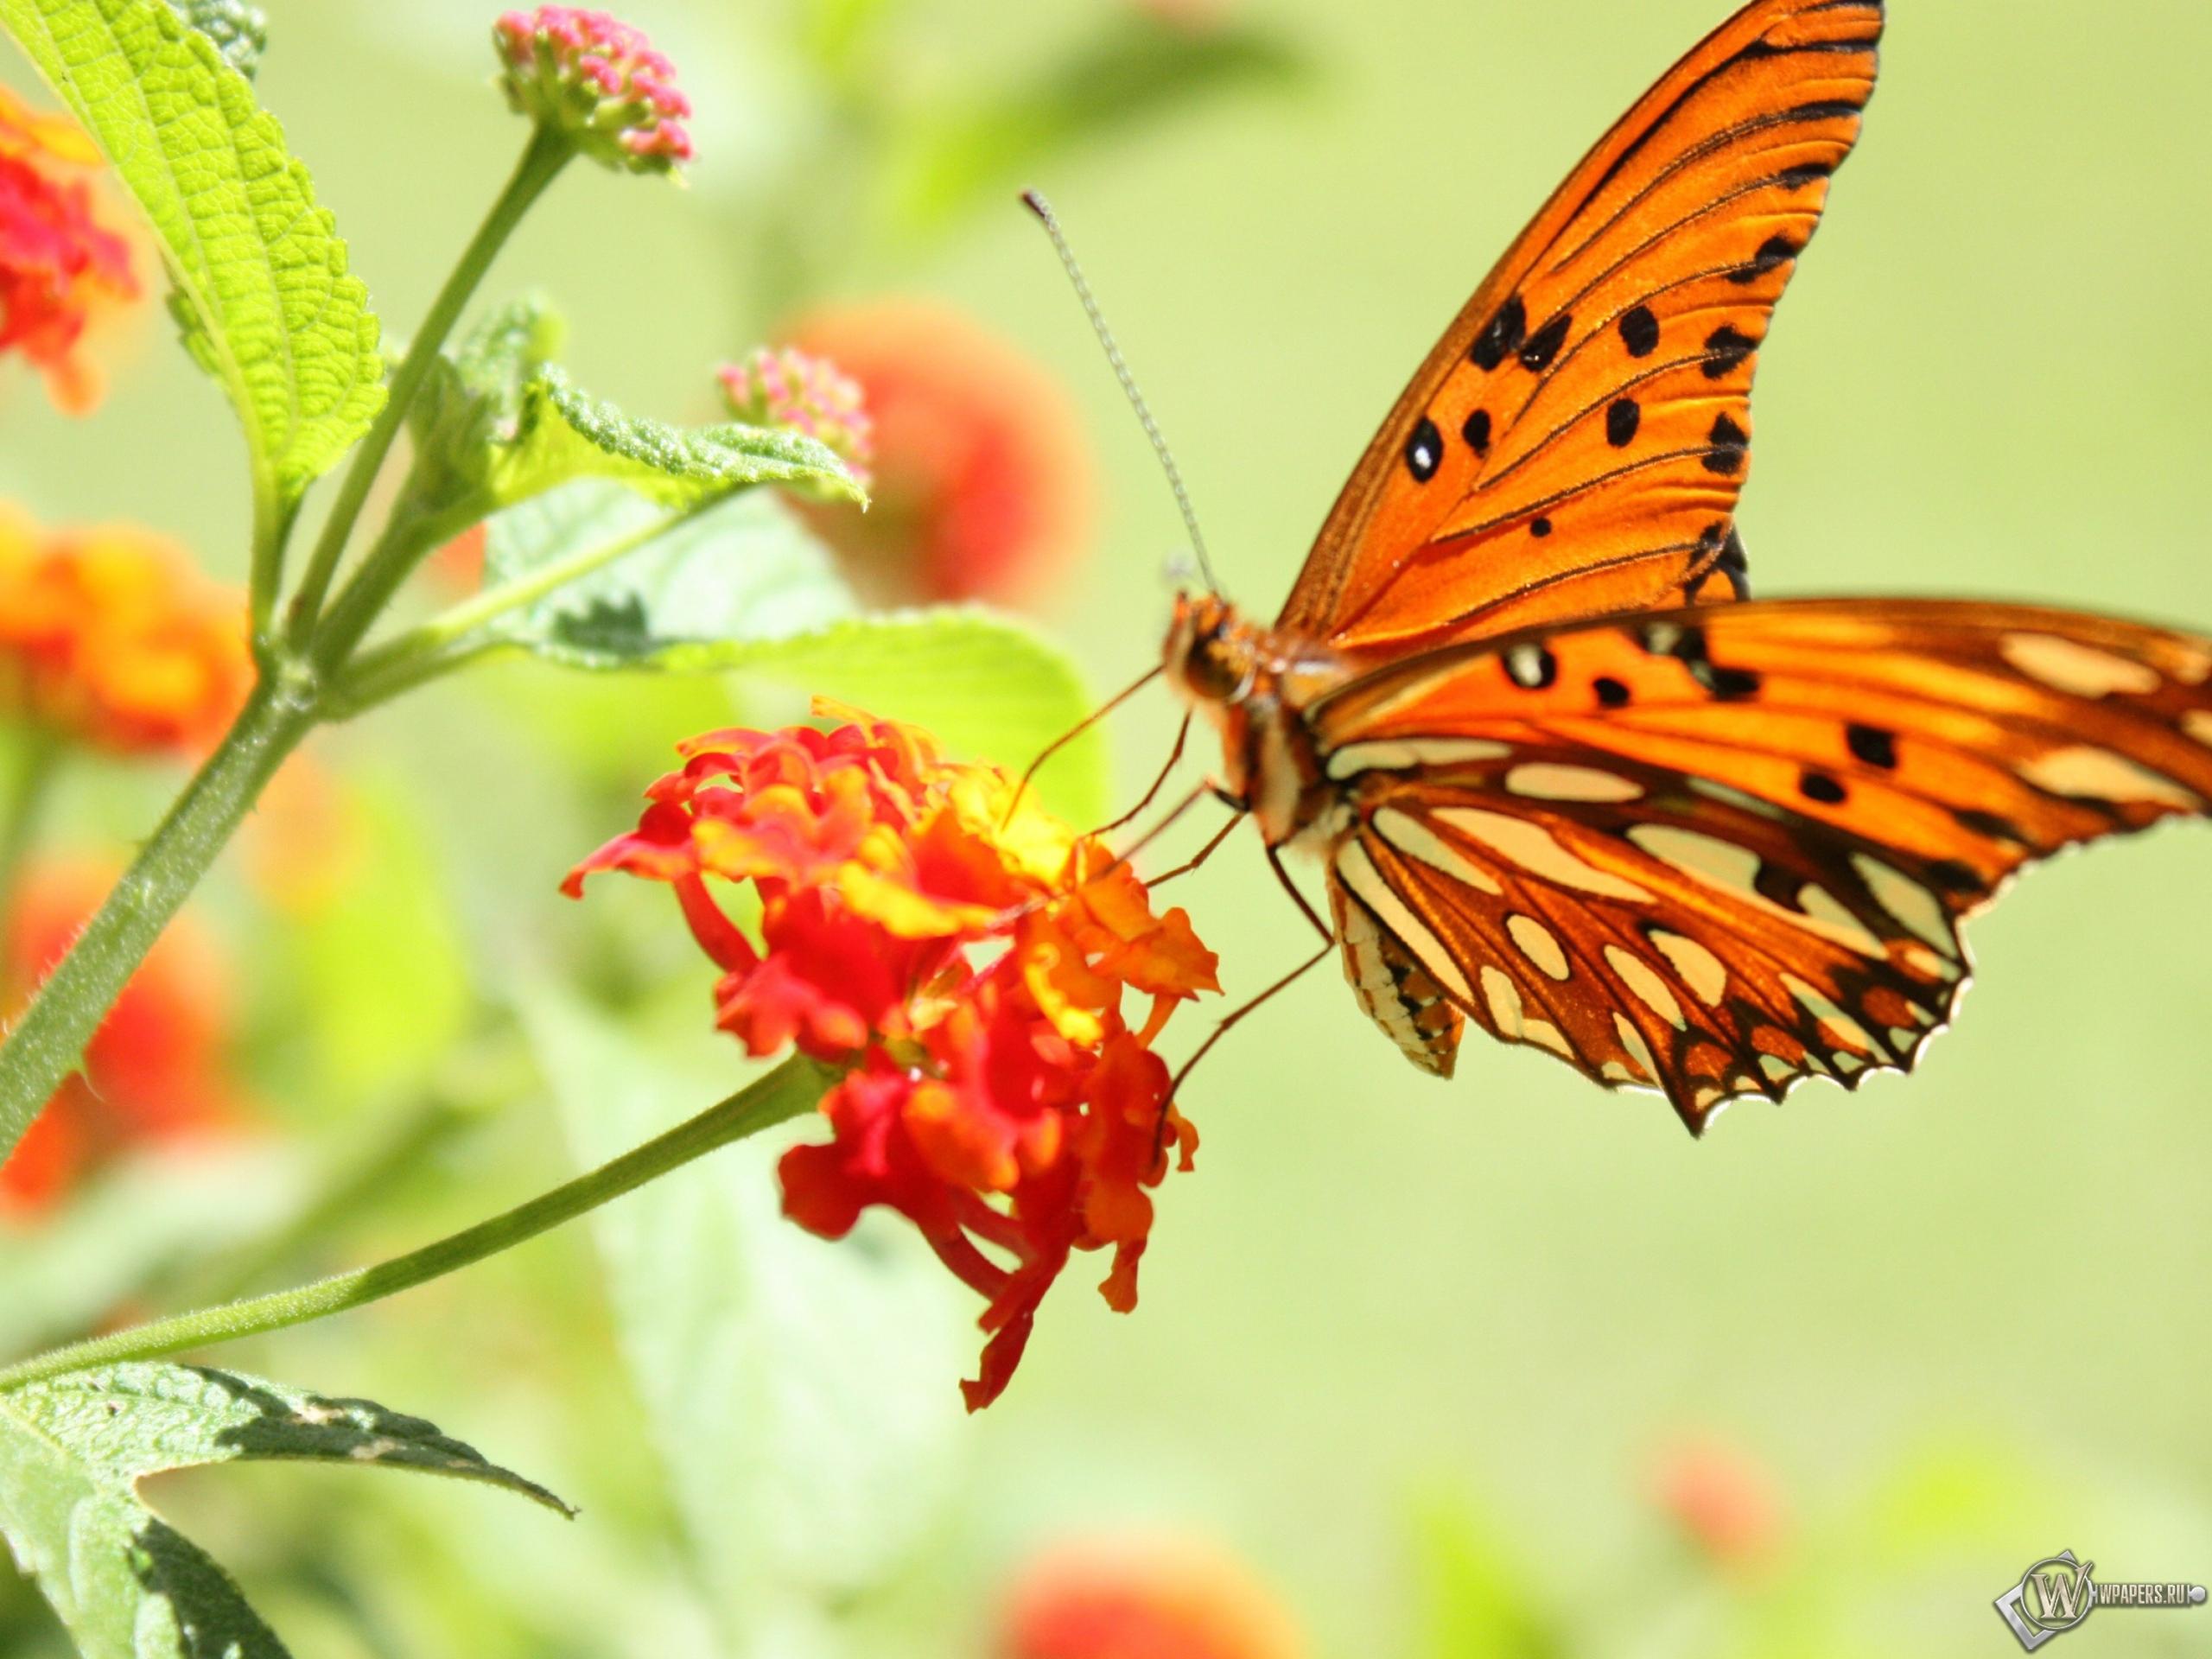 Бабочка на цветке 2560x1920